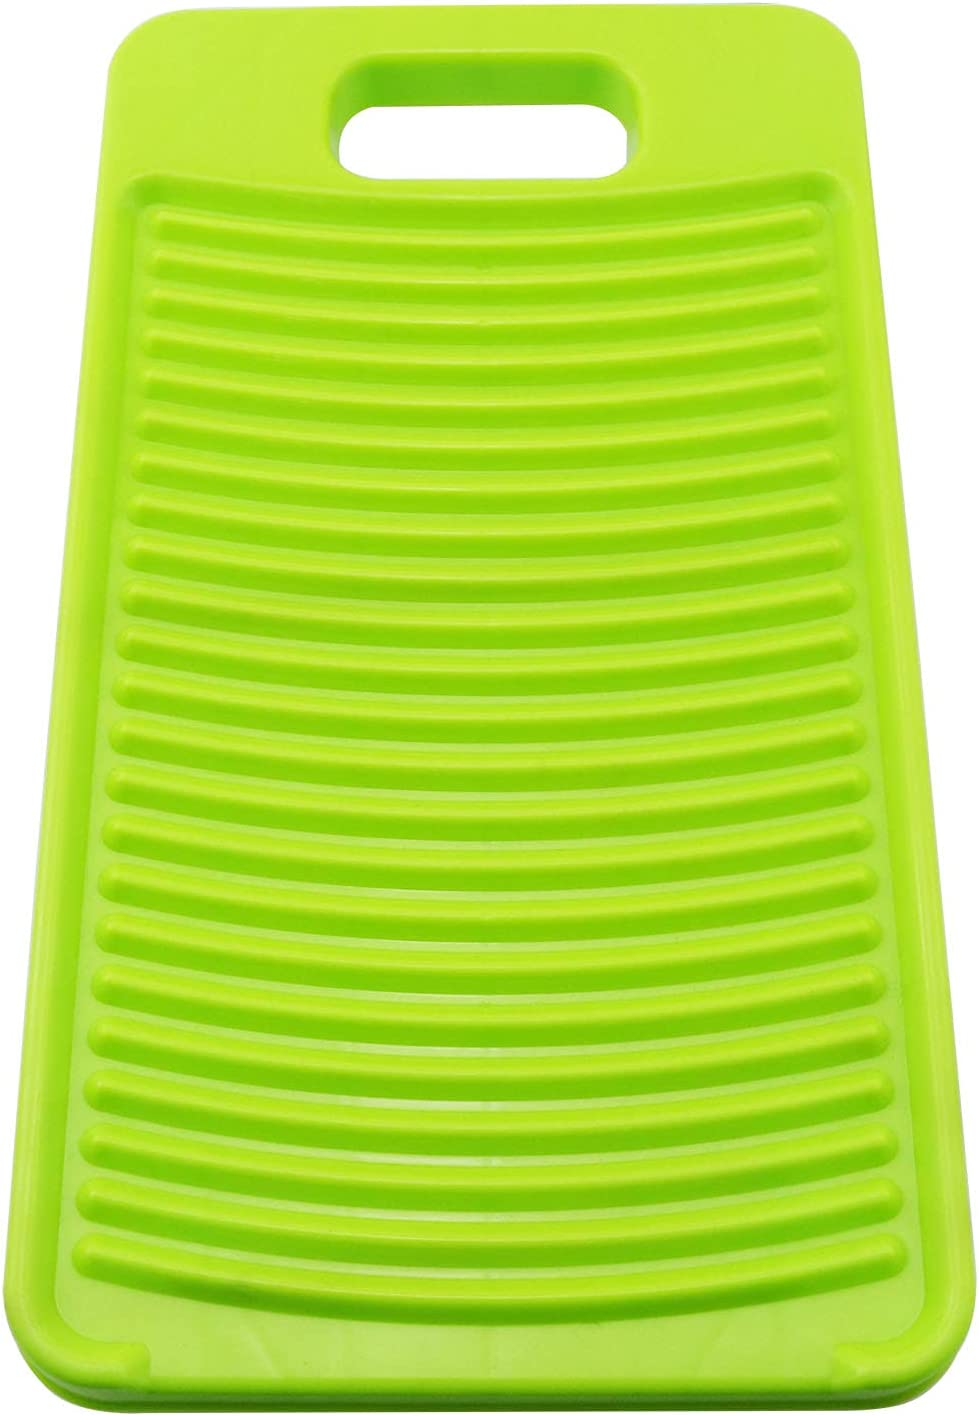 ZYAMY Antiskid Mini Washboard Popular brand in the world Sale Special Price Plastic Washing Board Household fo